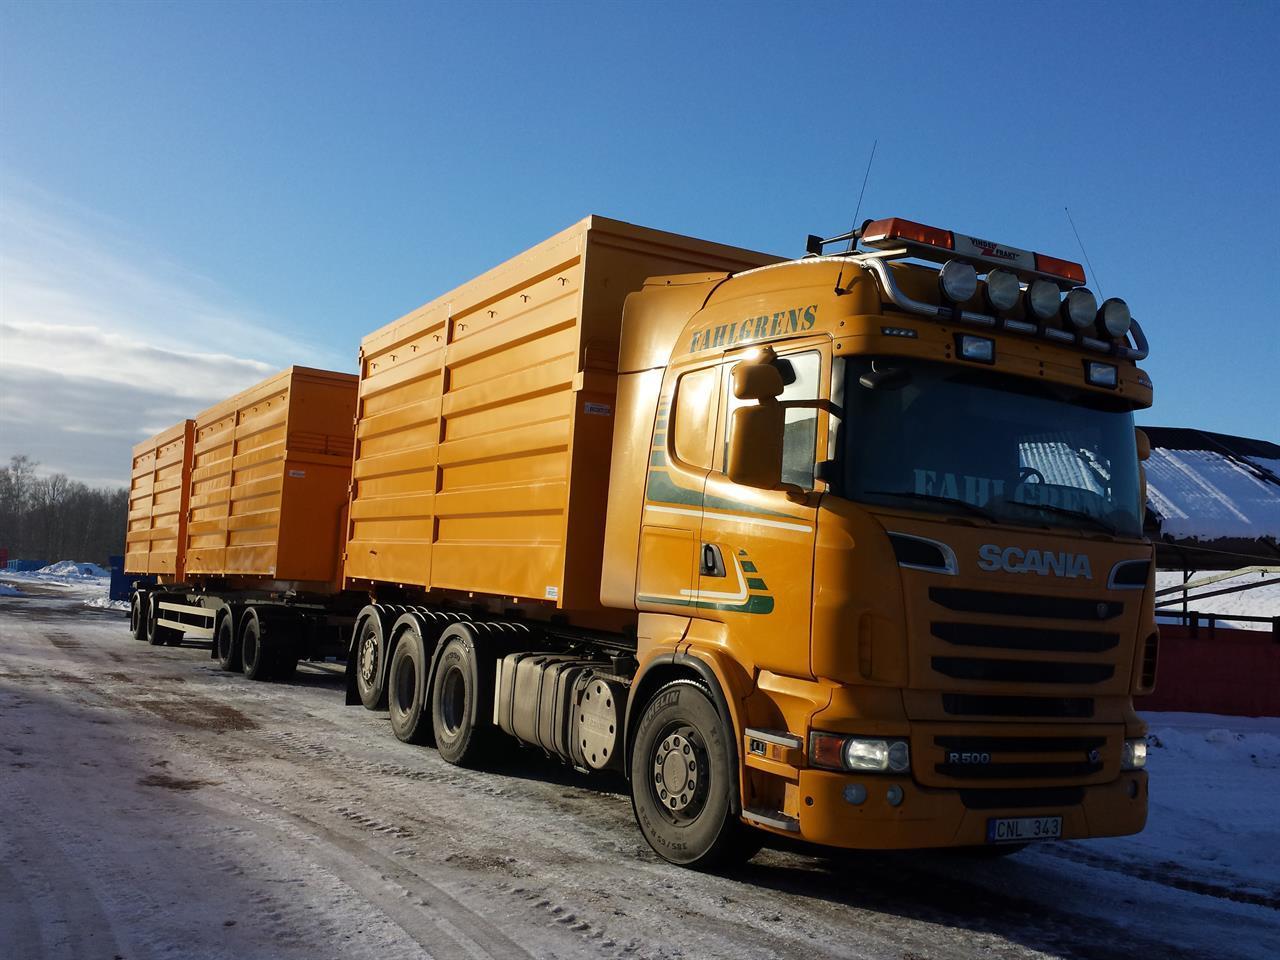 Fliscontainer i Domex 700, 40 kbm